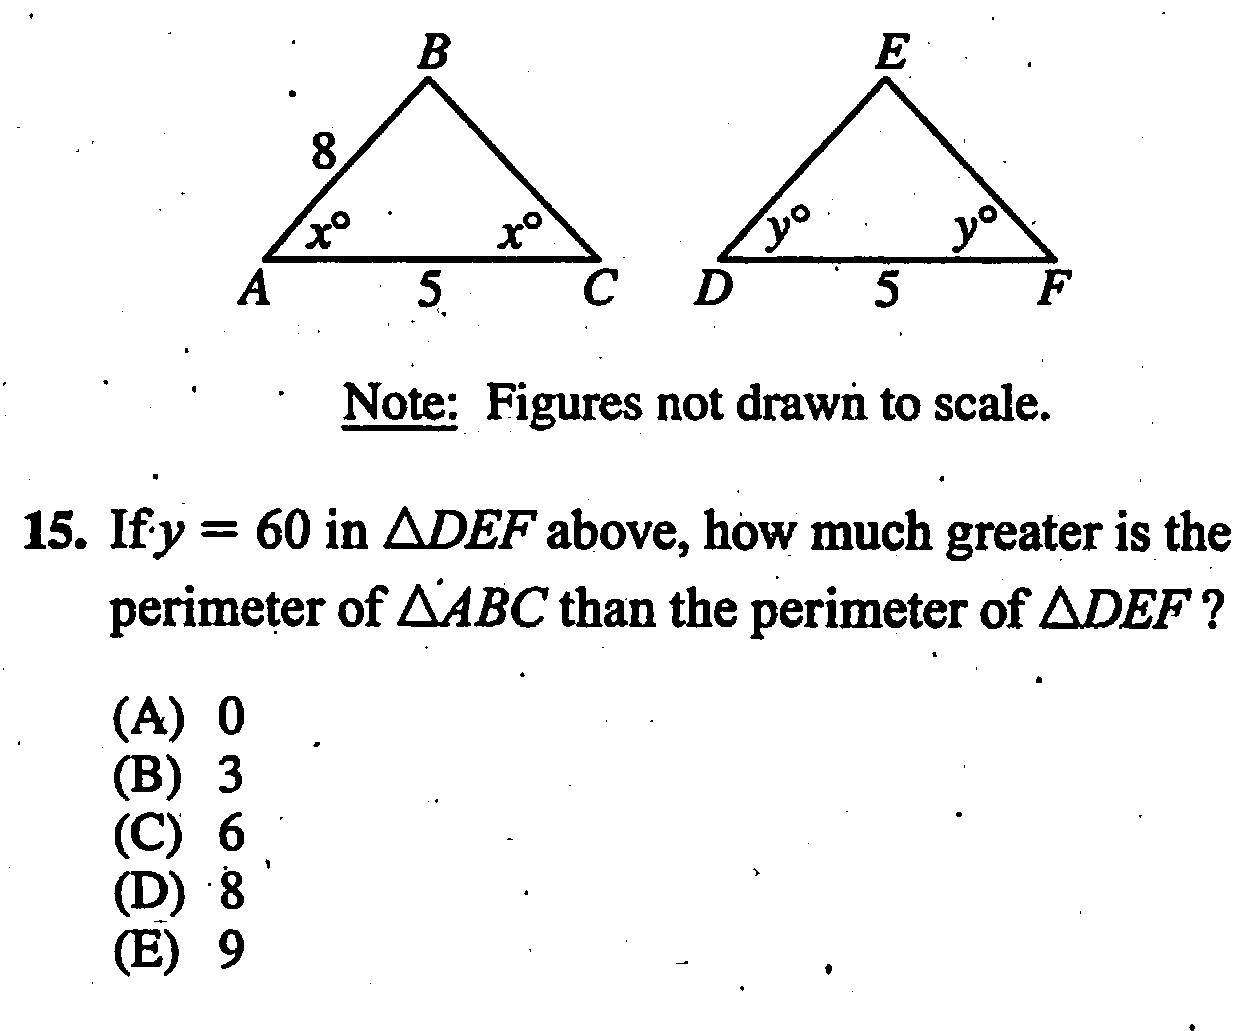 Drawn brains not Math SAT pictures drawn Scores